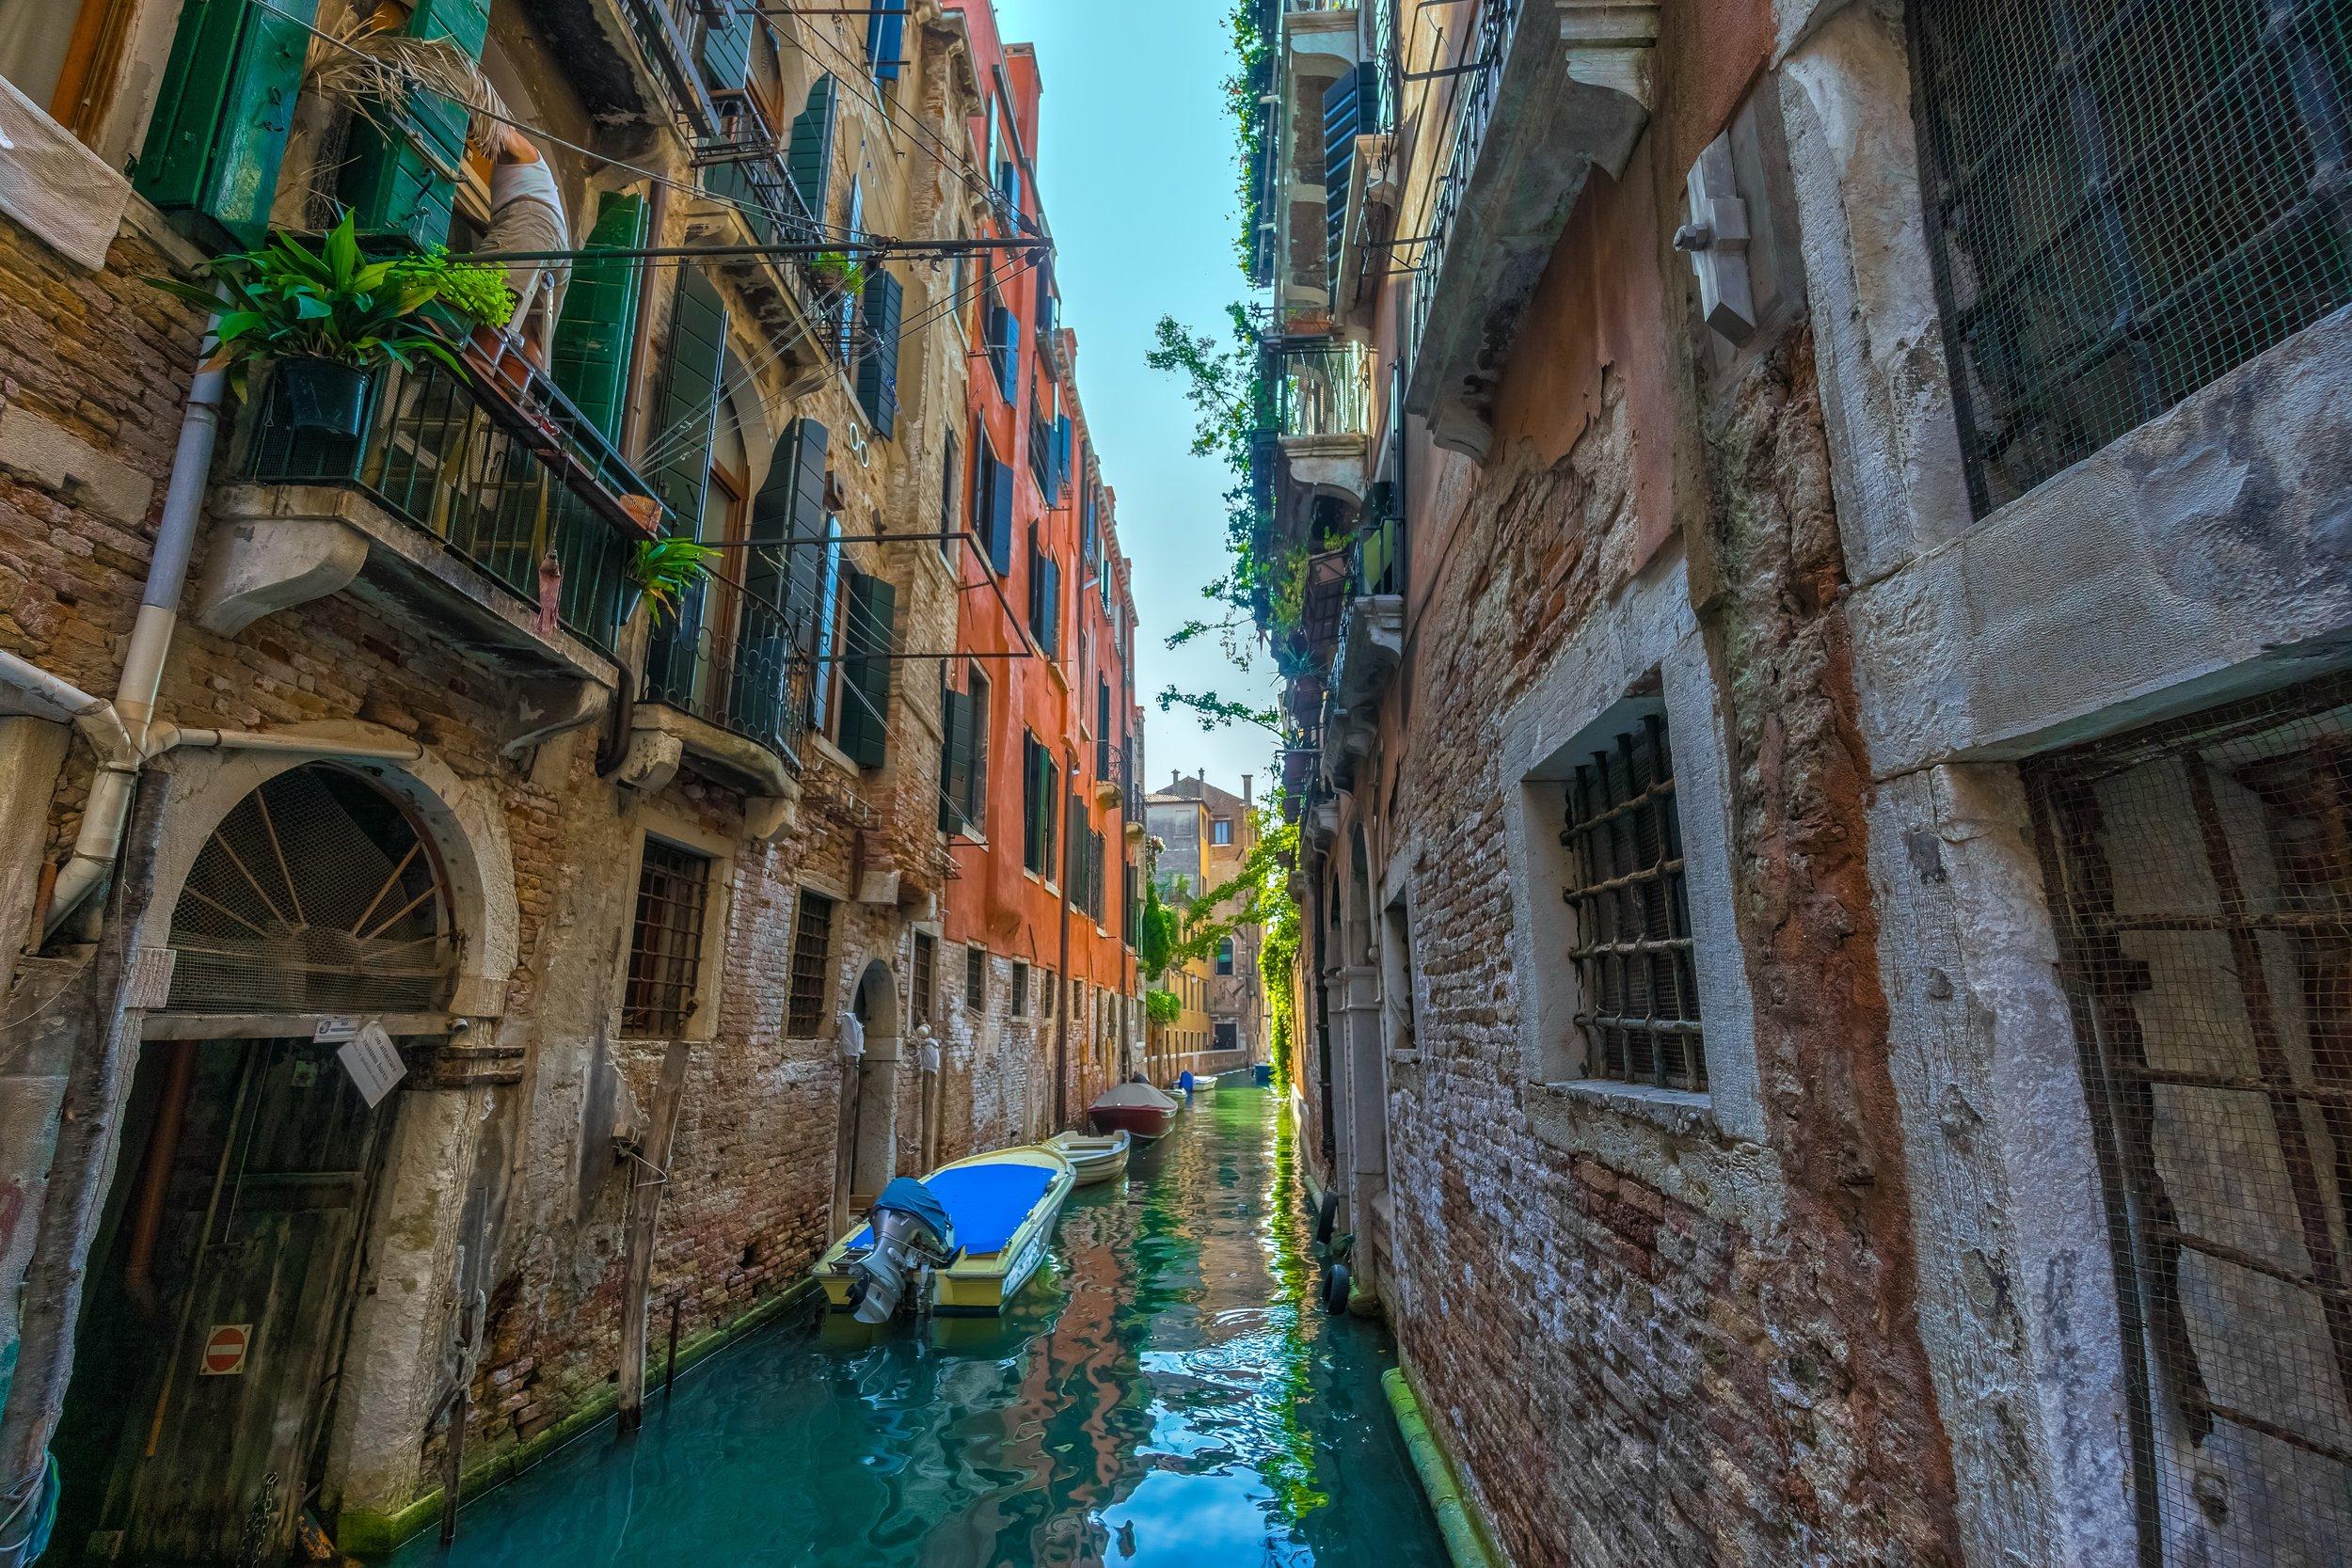 adventure-ancient-architecture-227417.jpg